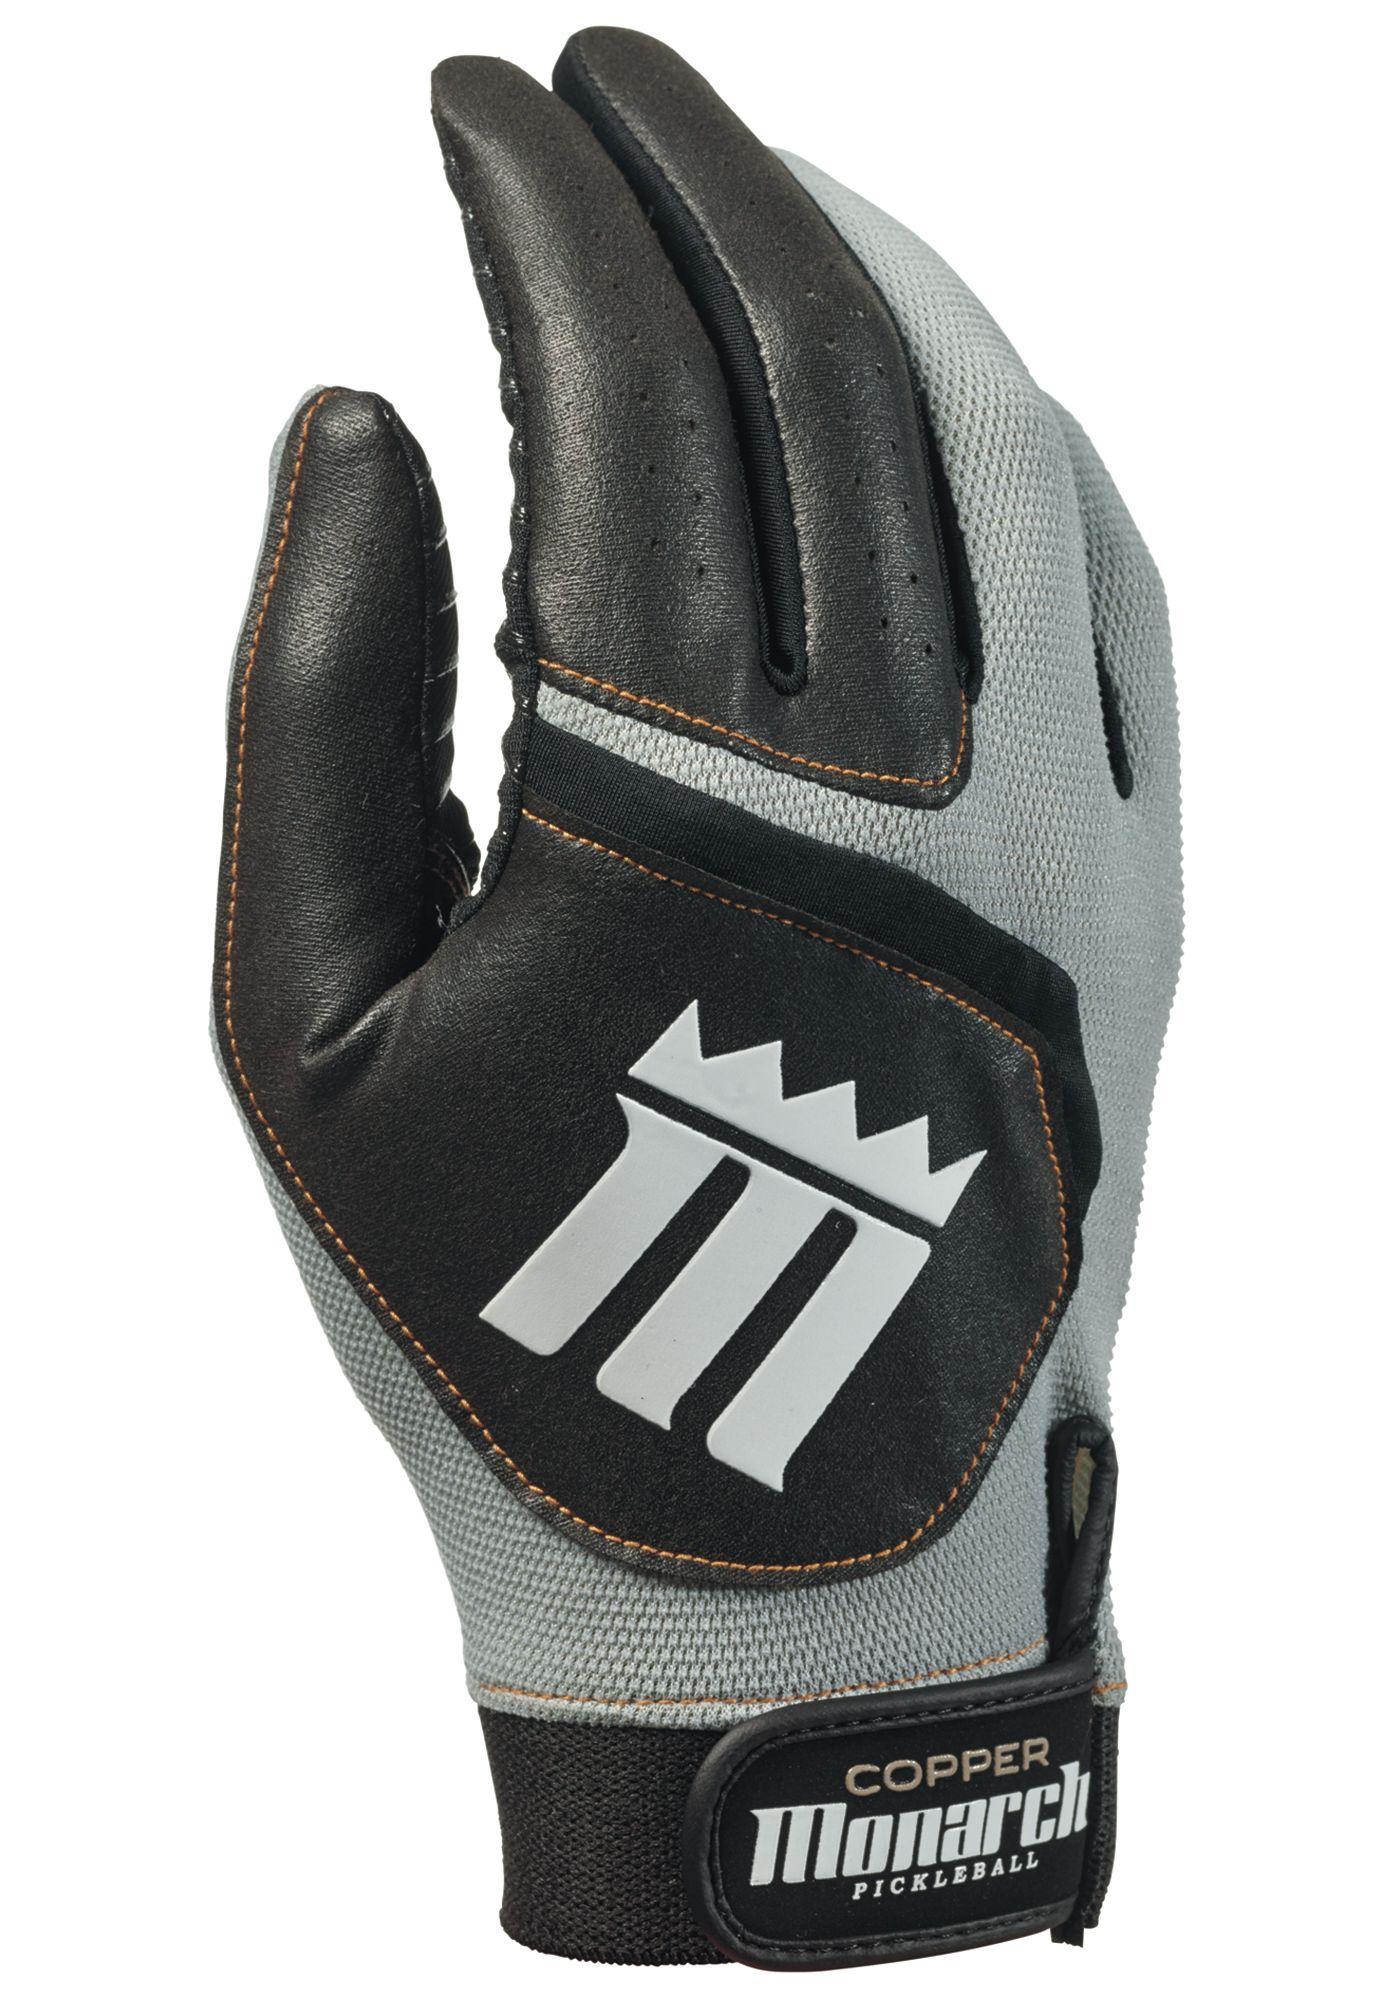 Monarch Men's One-Size Pickleball Glove